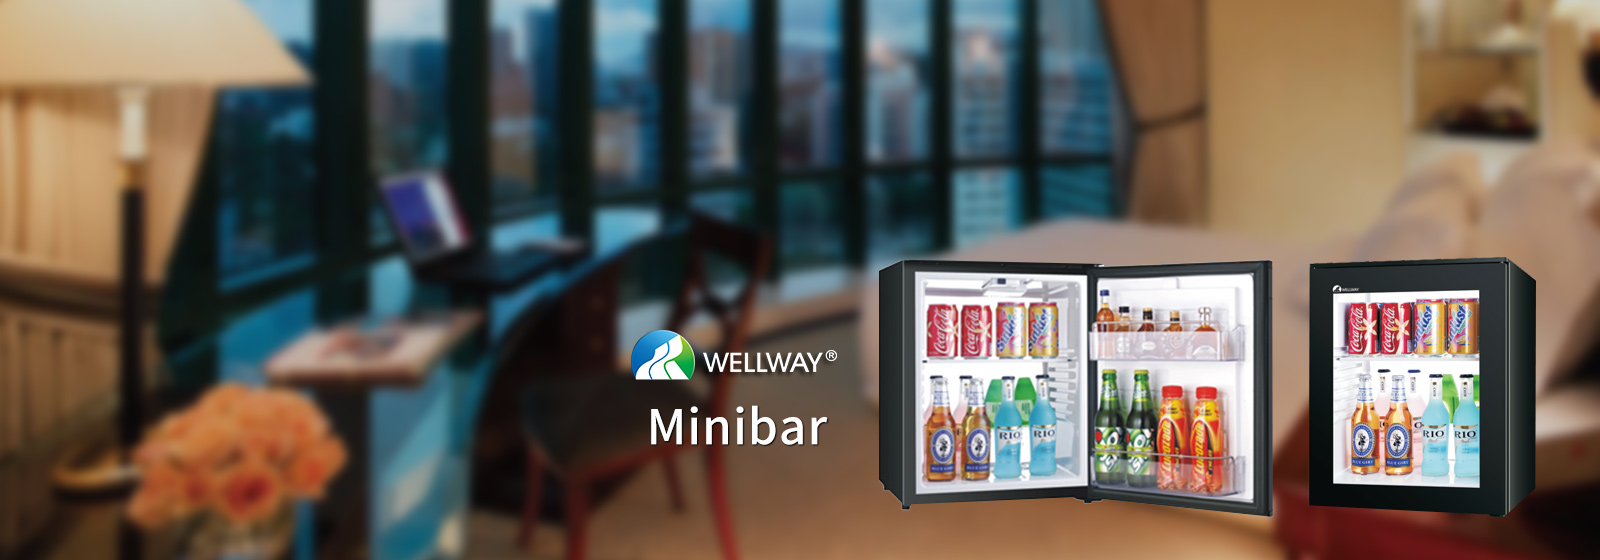 wellway minibar